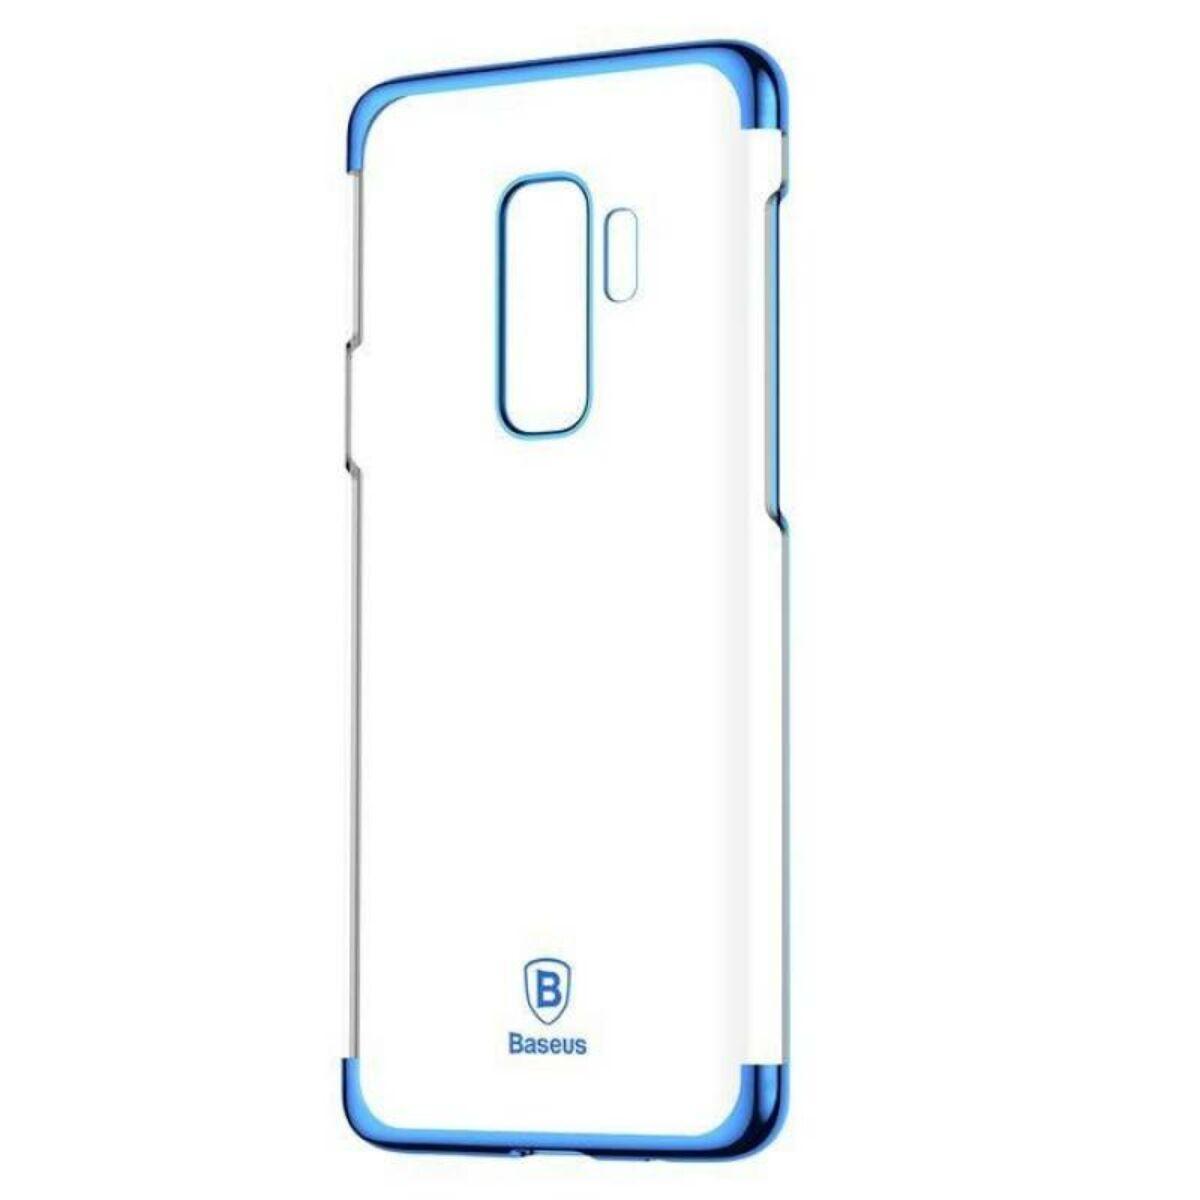 Baseus Samsung S9 Plus tok, Glitter, kék (WISAS9P-DW03)